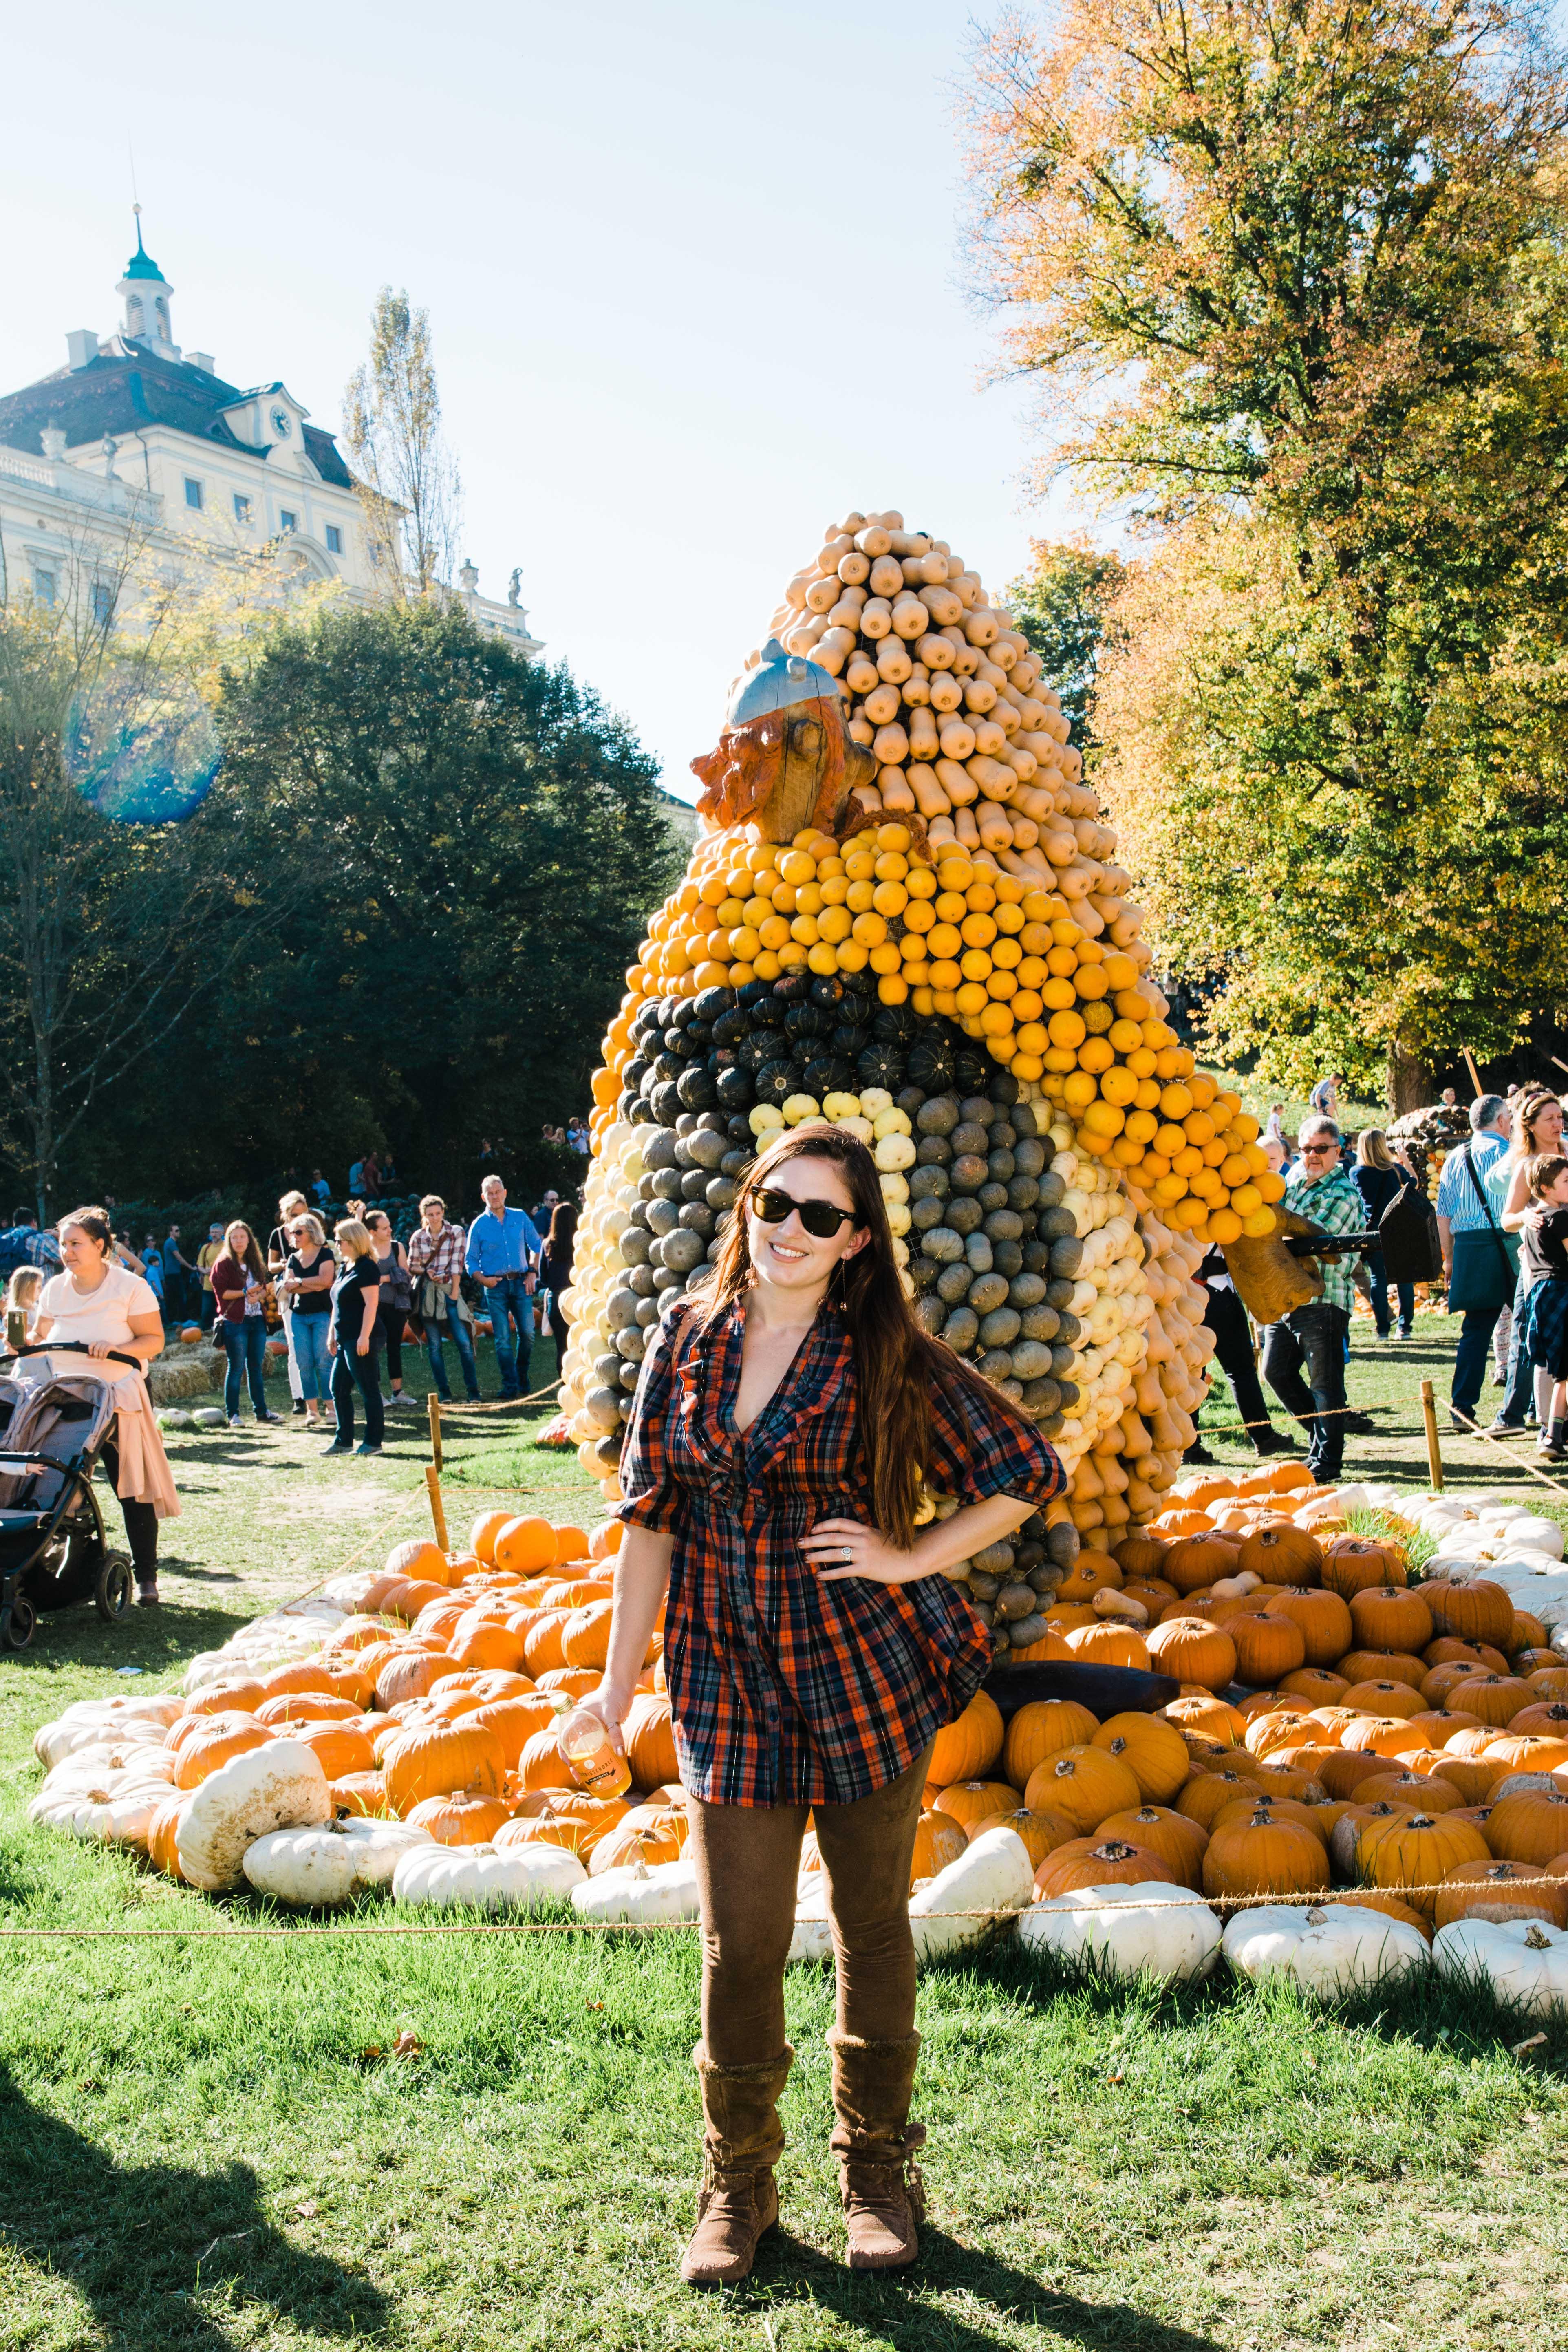 ludwigsburg pumpkinfest 2017 lovelaughexplore.com-21